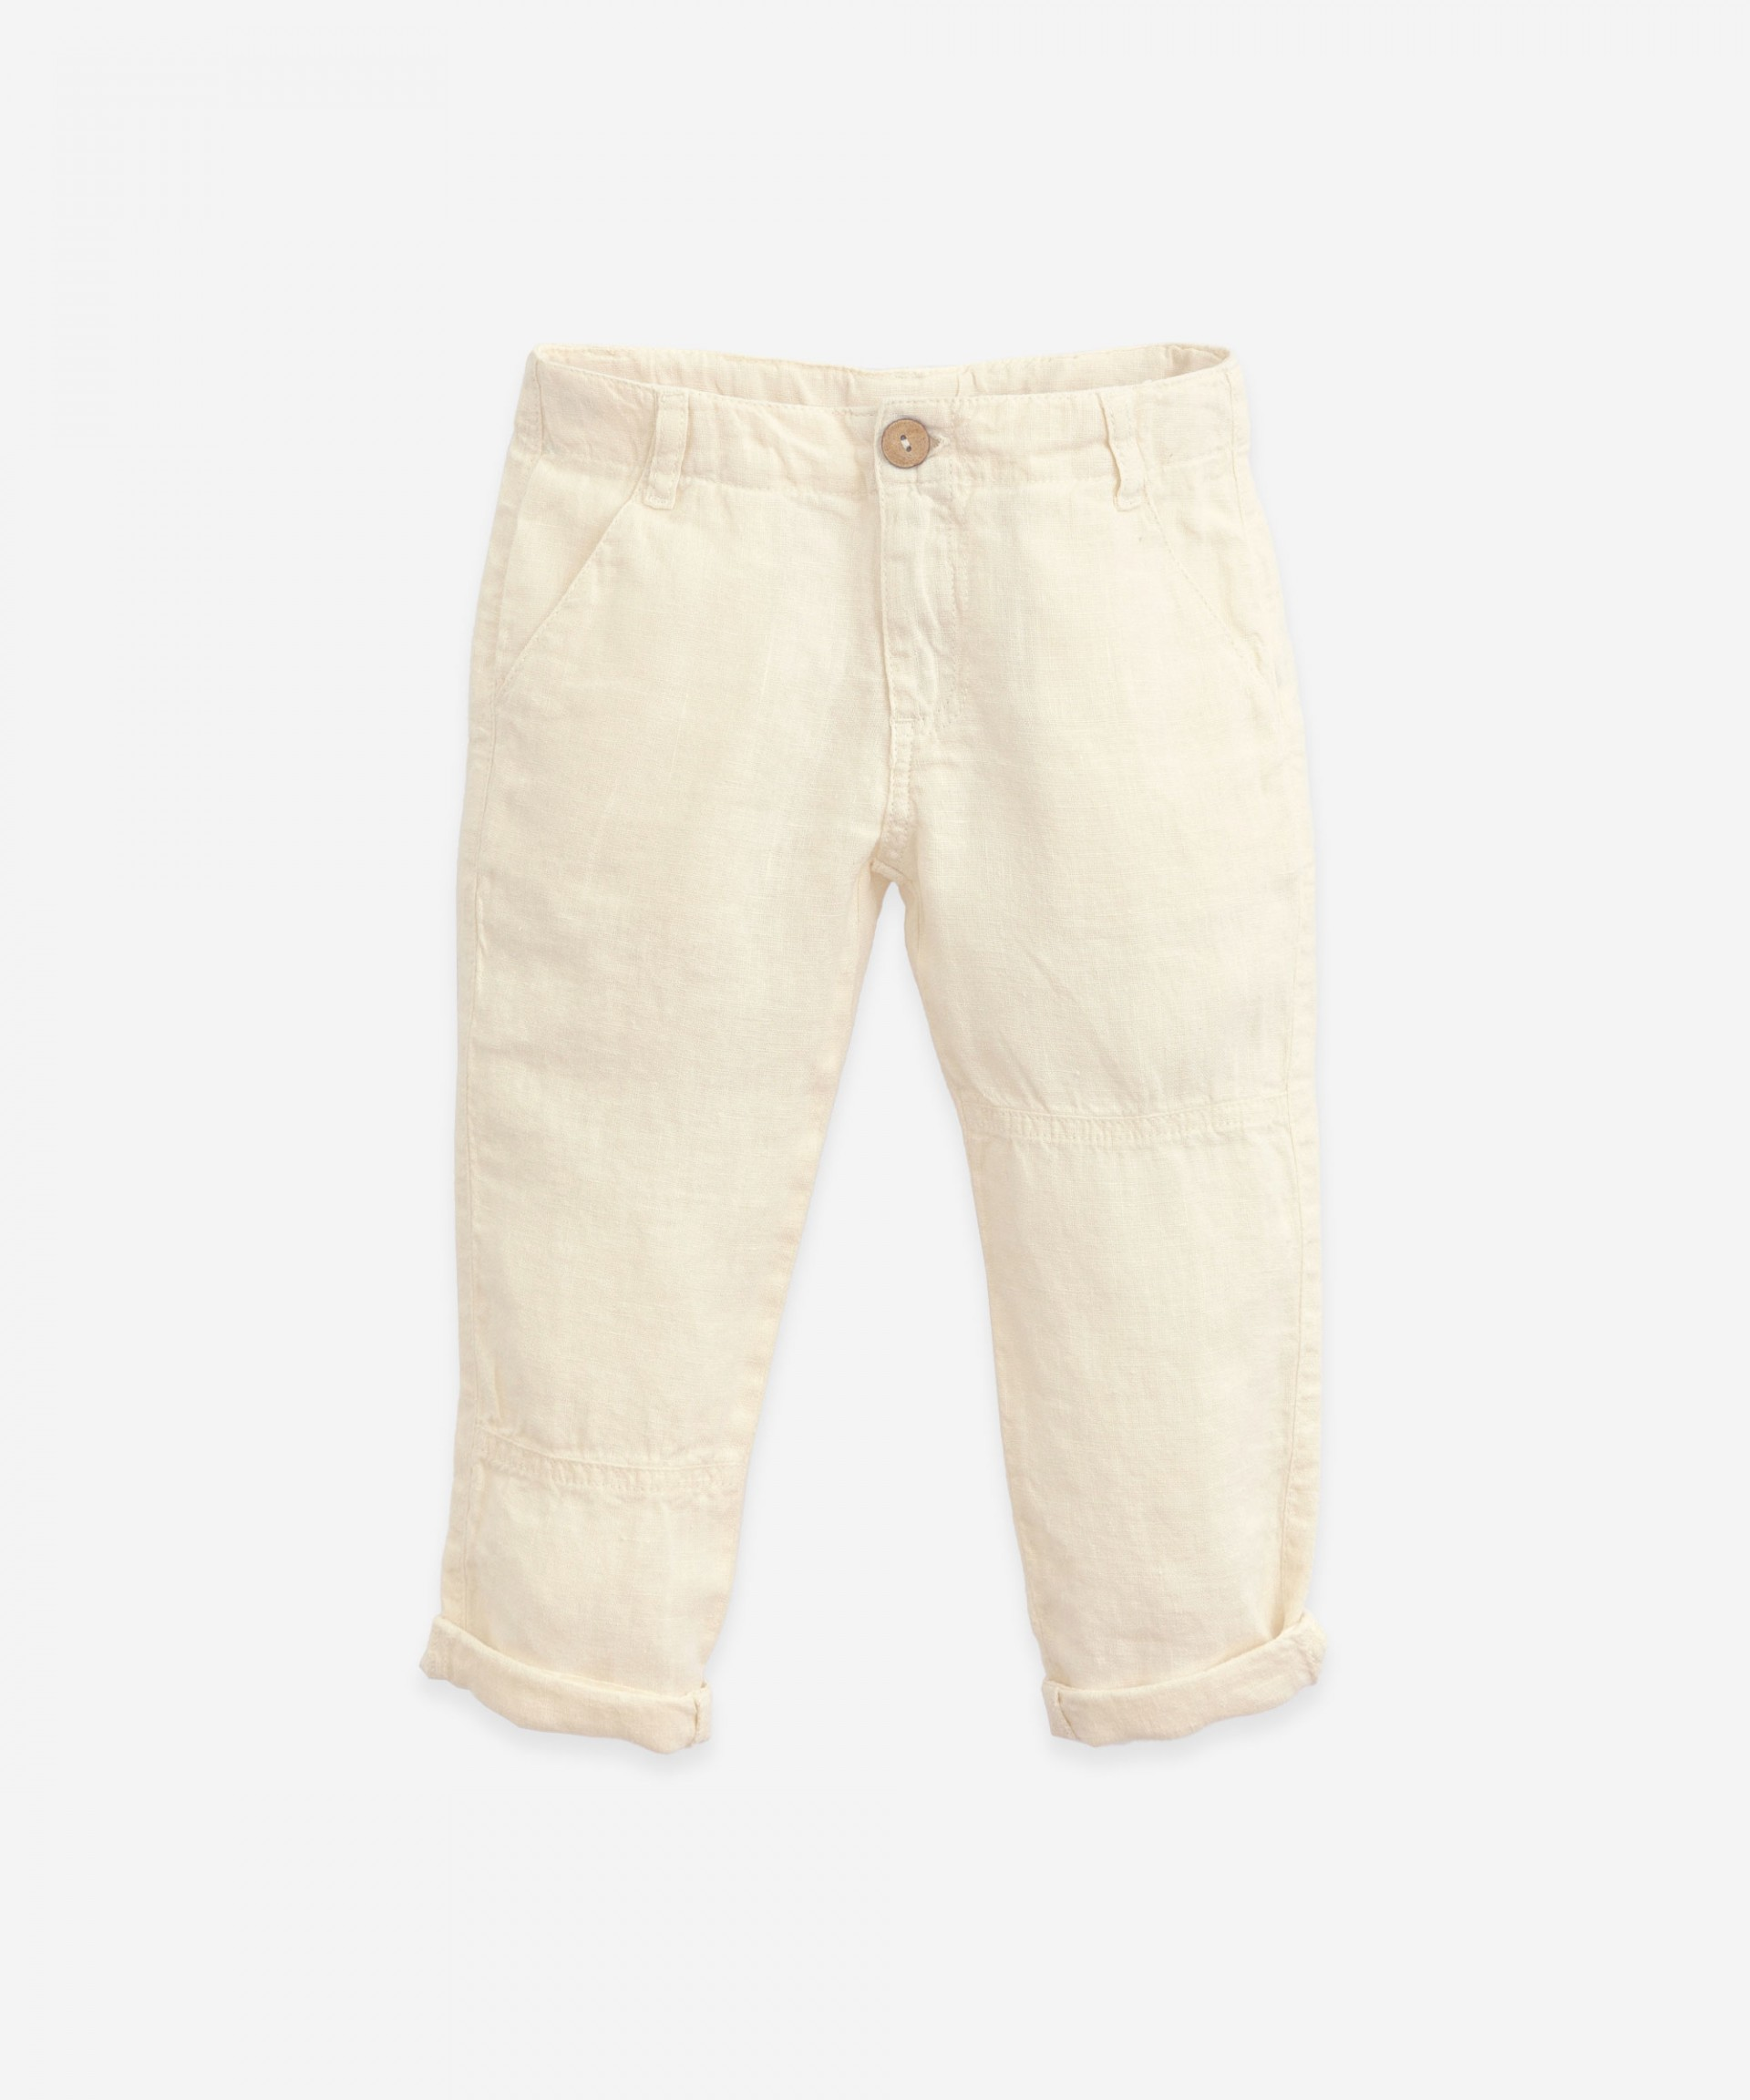 Linen trousers | Botany